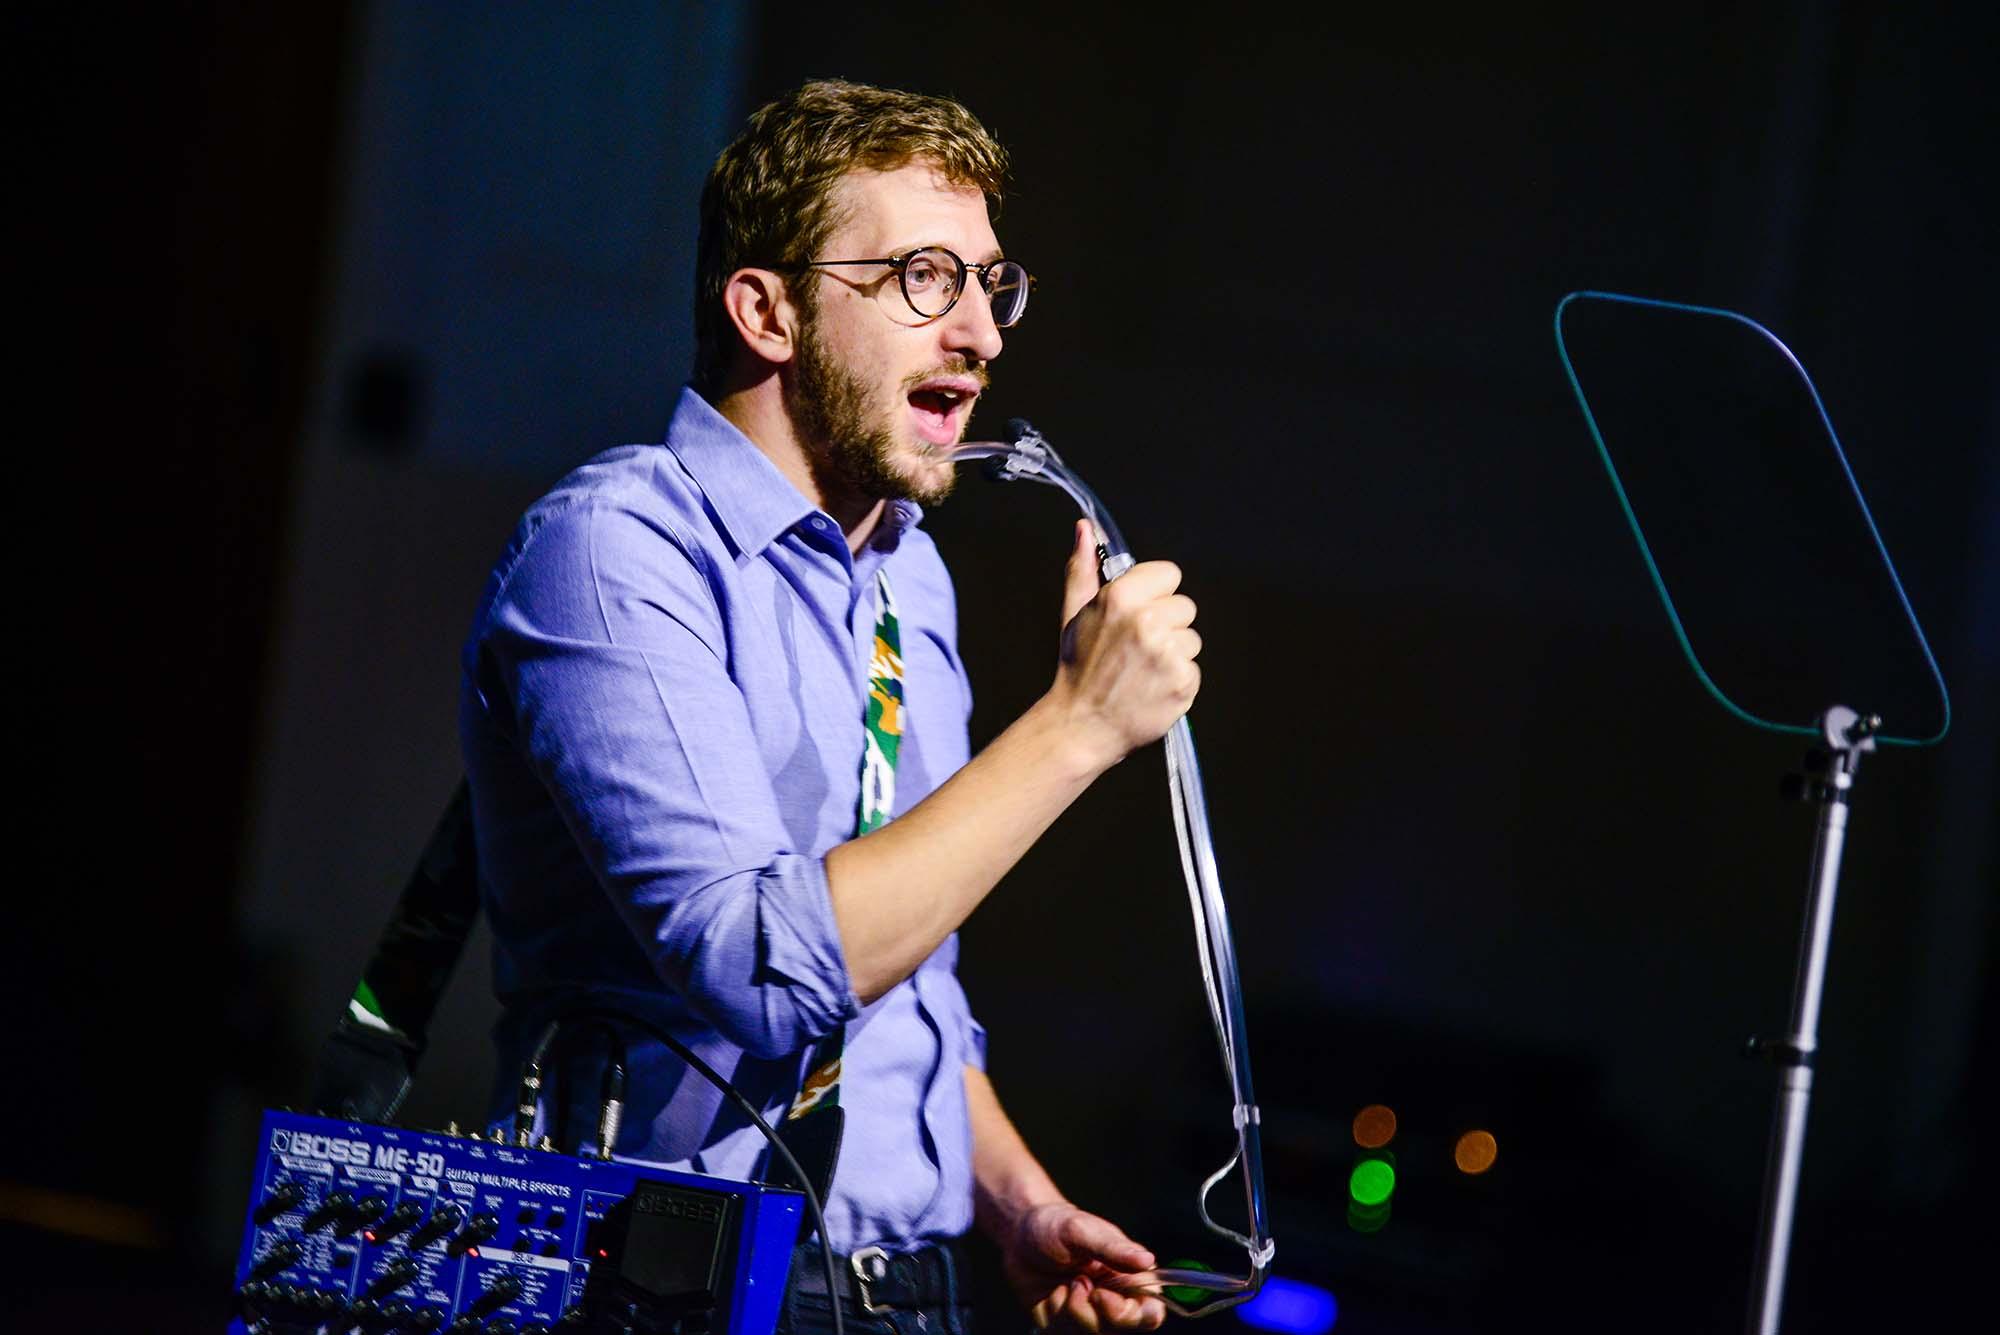 Festival of Voice 2016